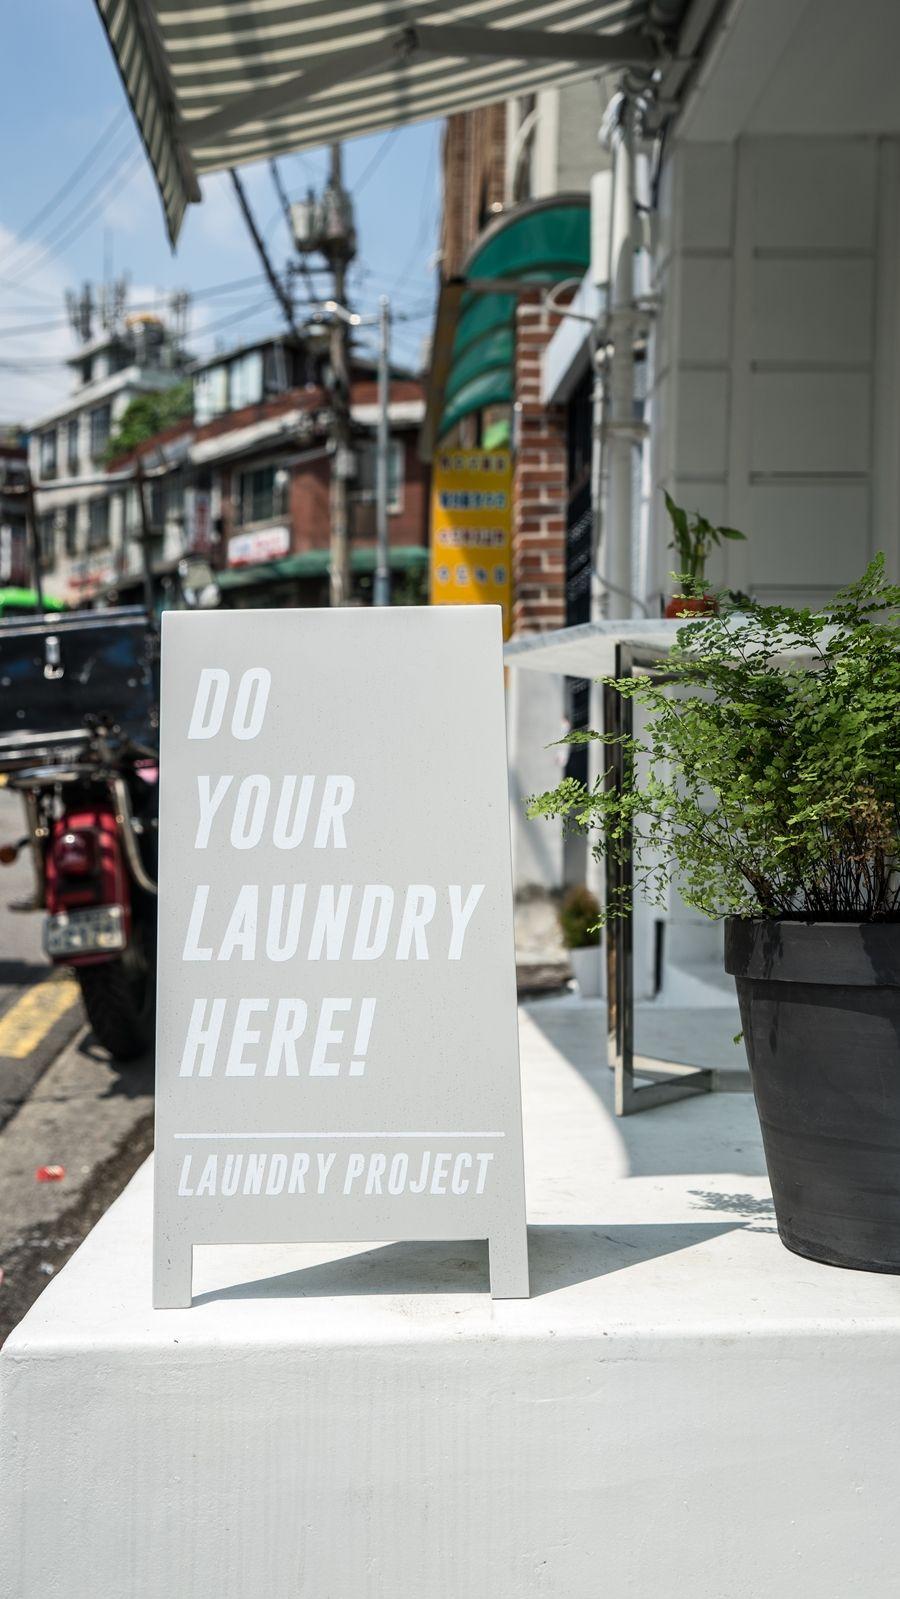 Do Your Laundry Here Laundryproject 론드리프로젝트 Seoul Signboard Desain